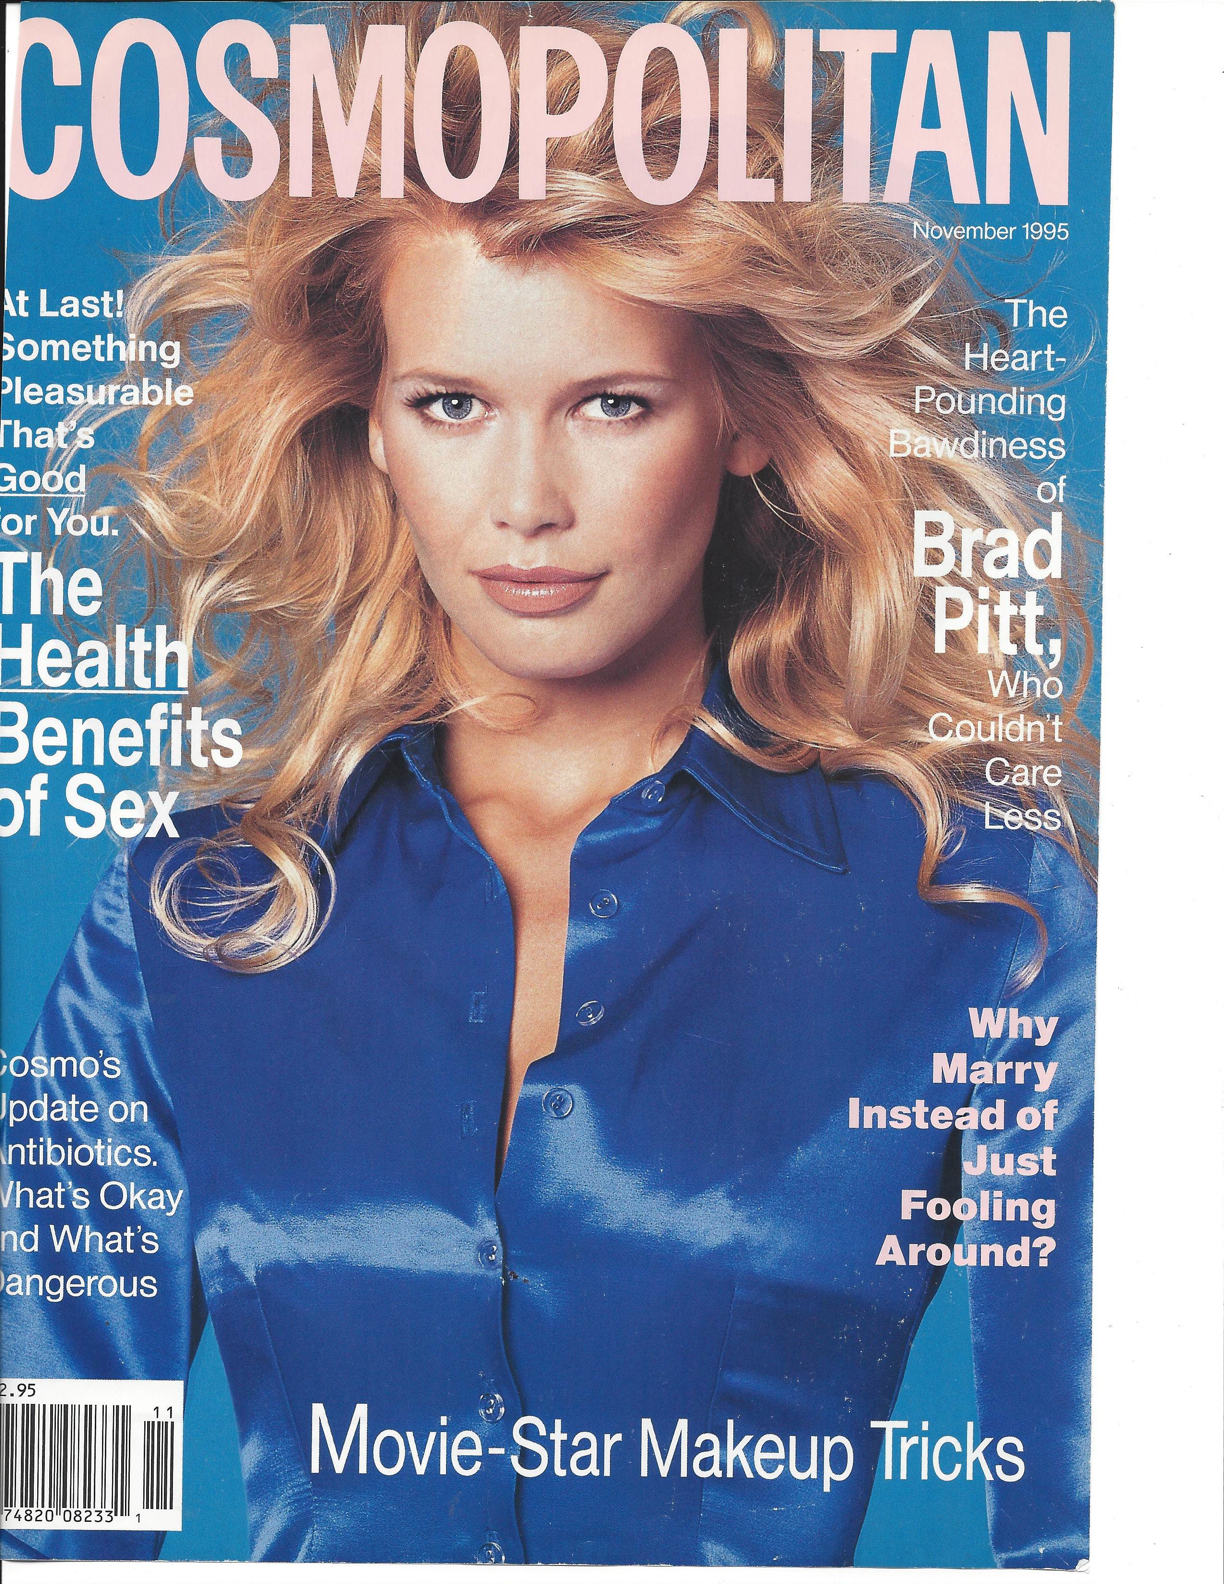 Cosmopolitan cover.jpg